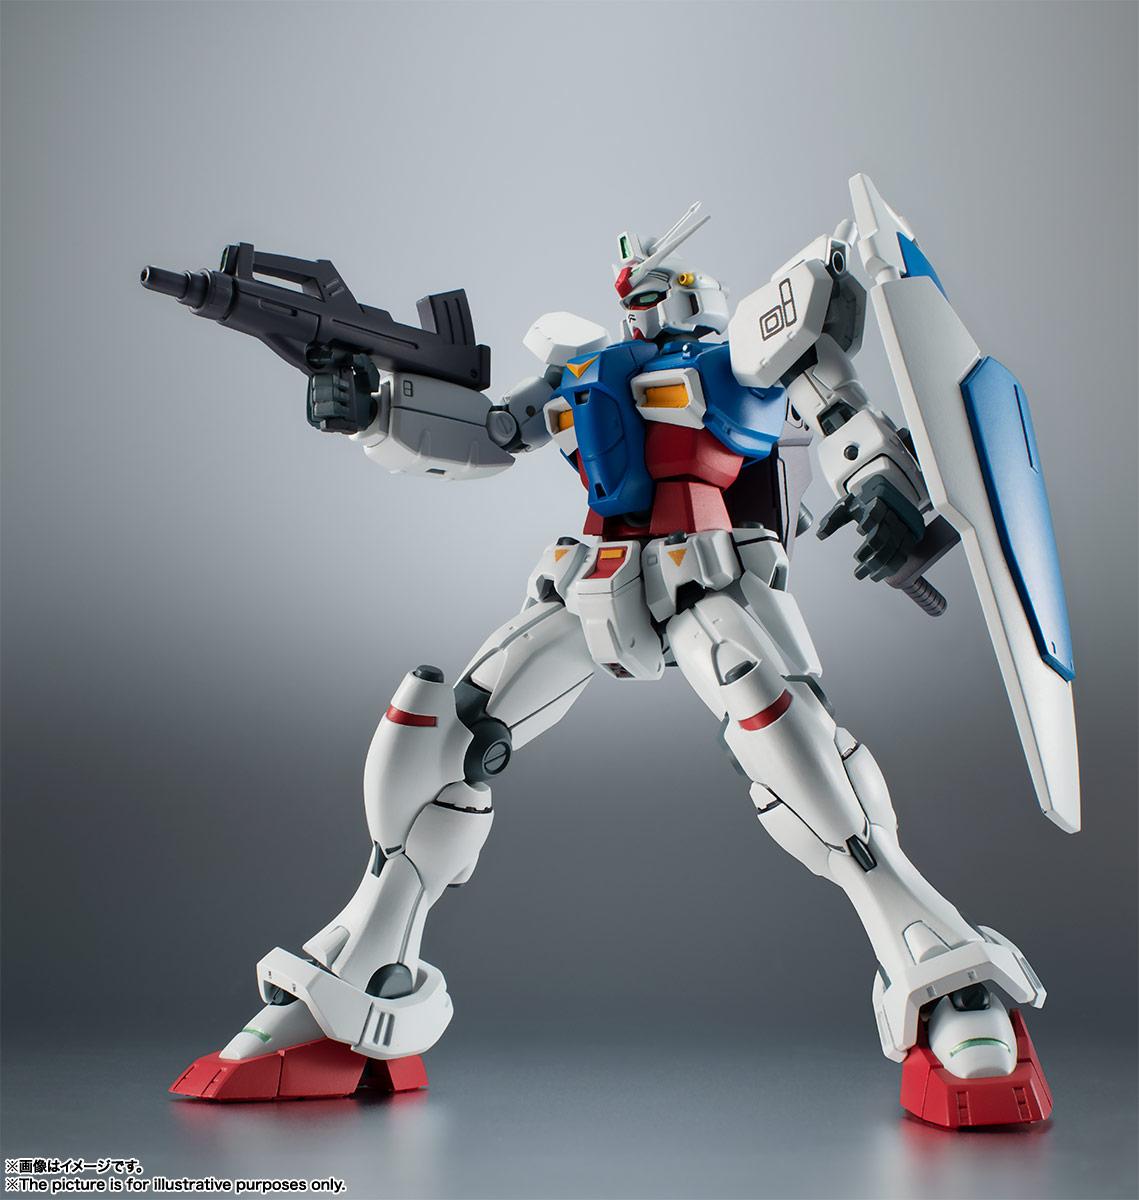 ROBOT魂〈SIDE MS〉『RX-78GP01 ガンダム試作1号機 ver. A.N.I.M.E.』可動フィギュア-007